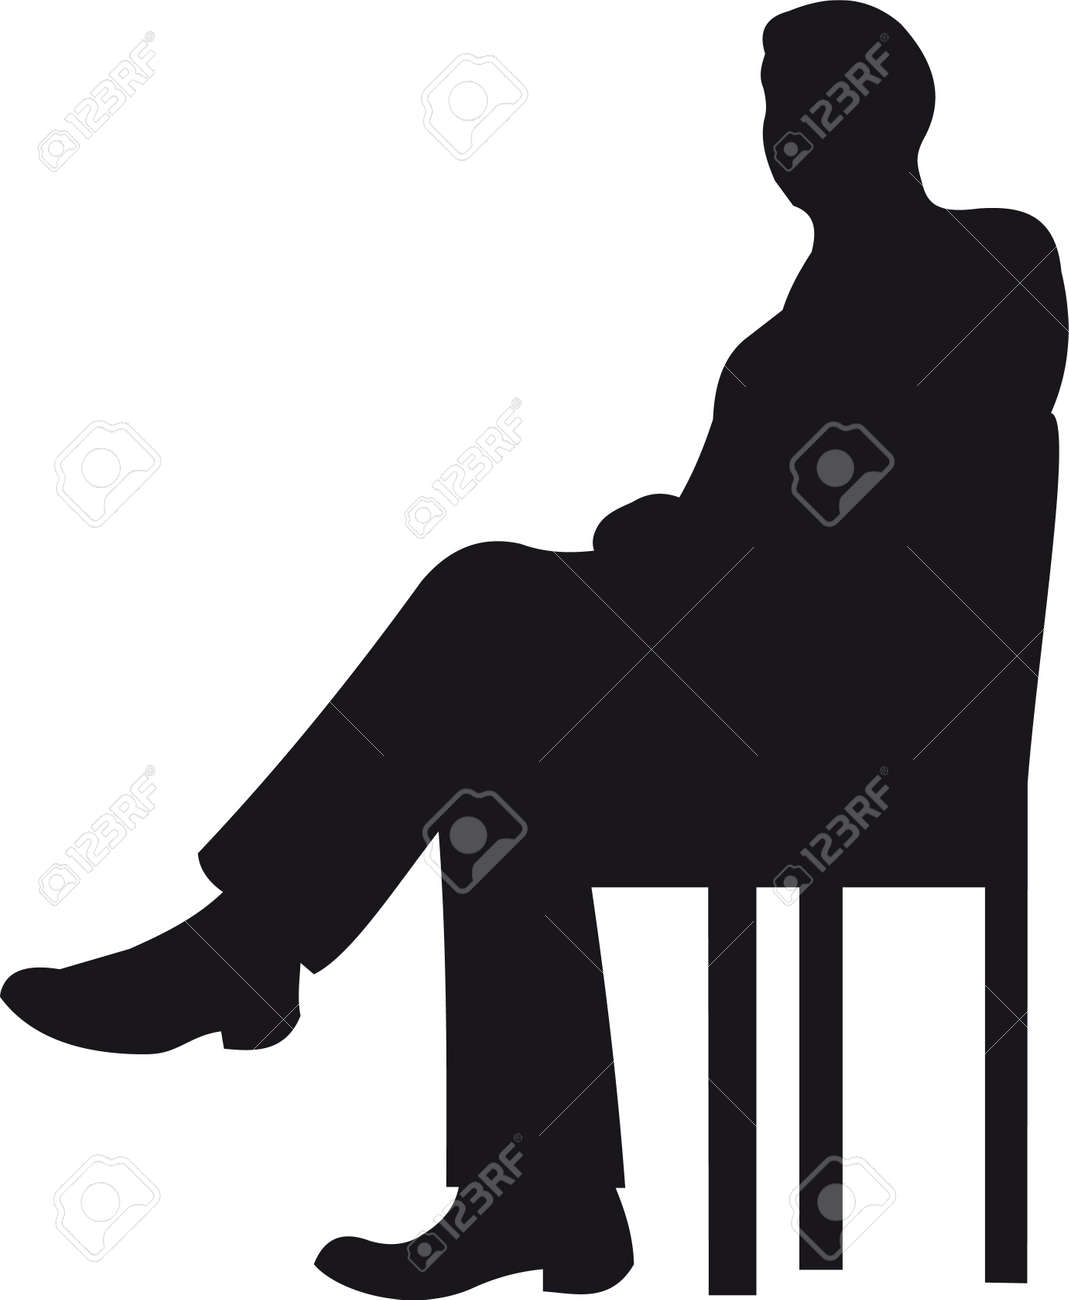 Businessman silhouette Stock Vector - 8711270